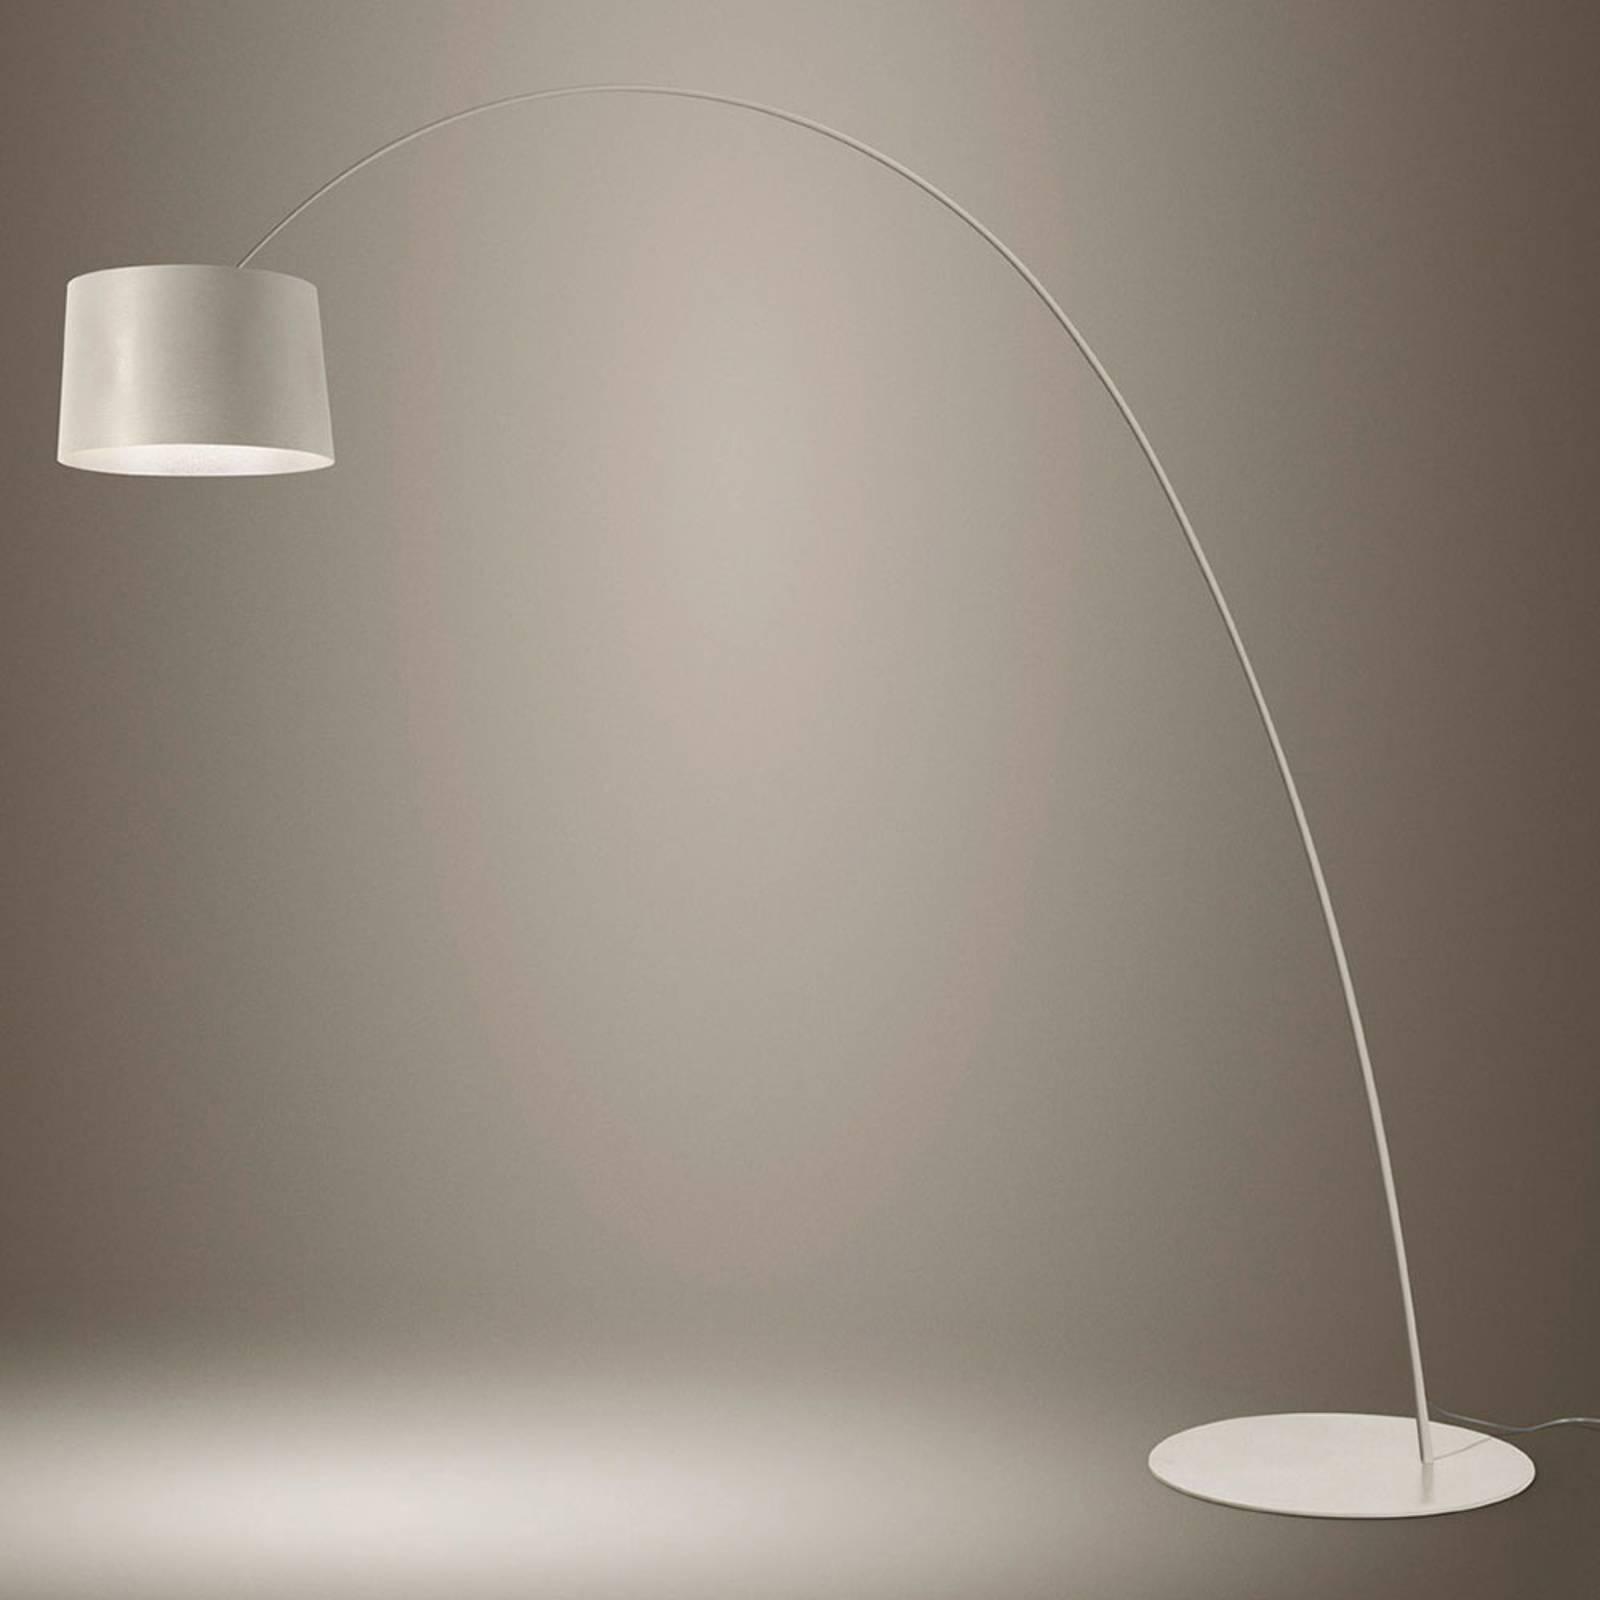 Foscarini Twiggy Elle LED-Stehleuchte greige